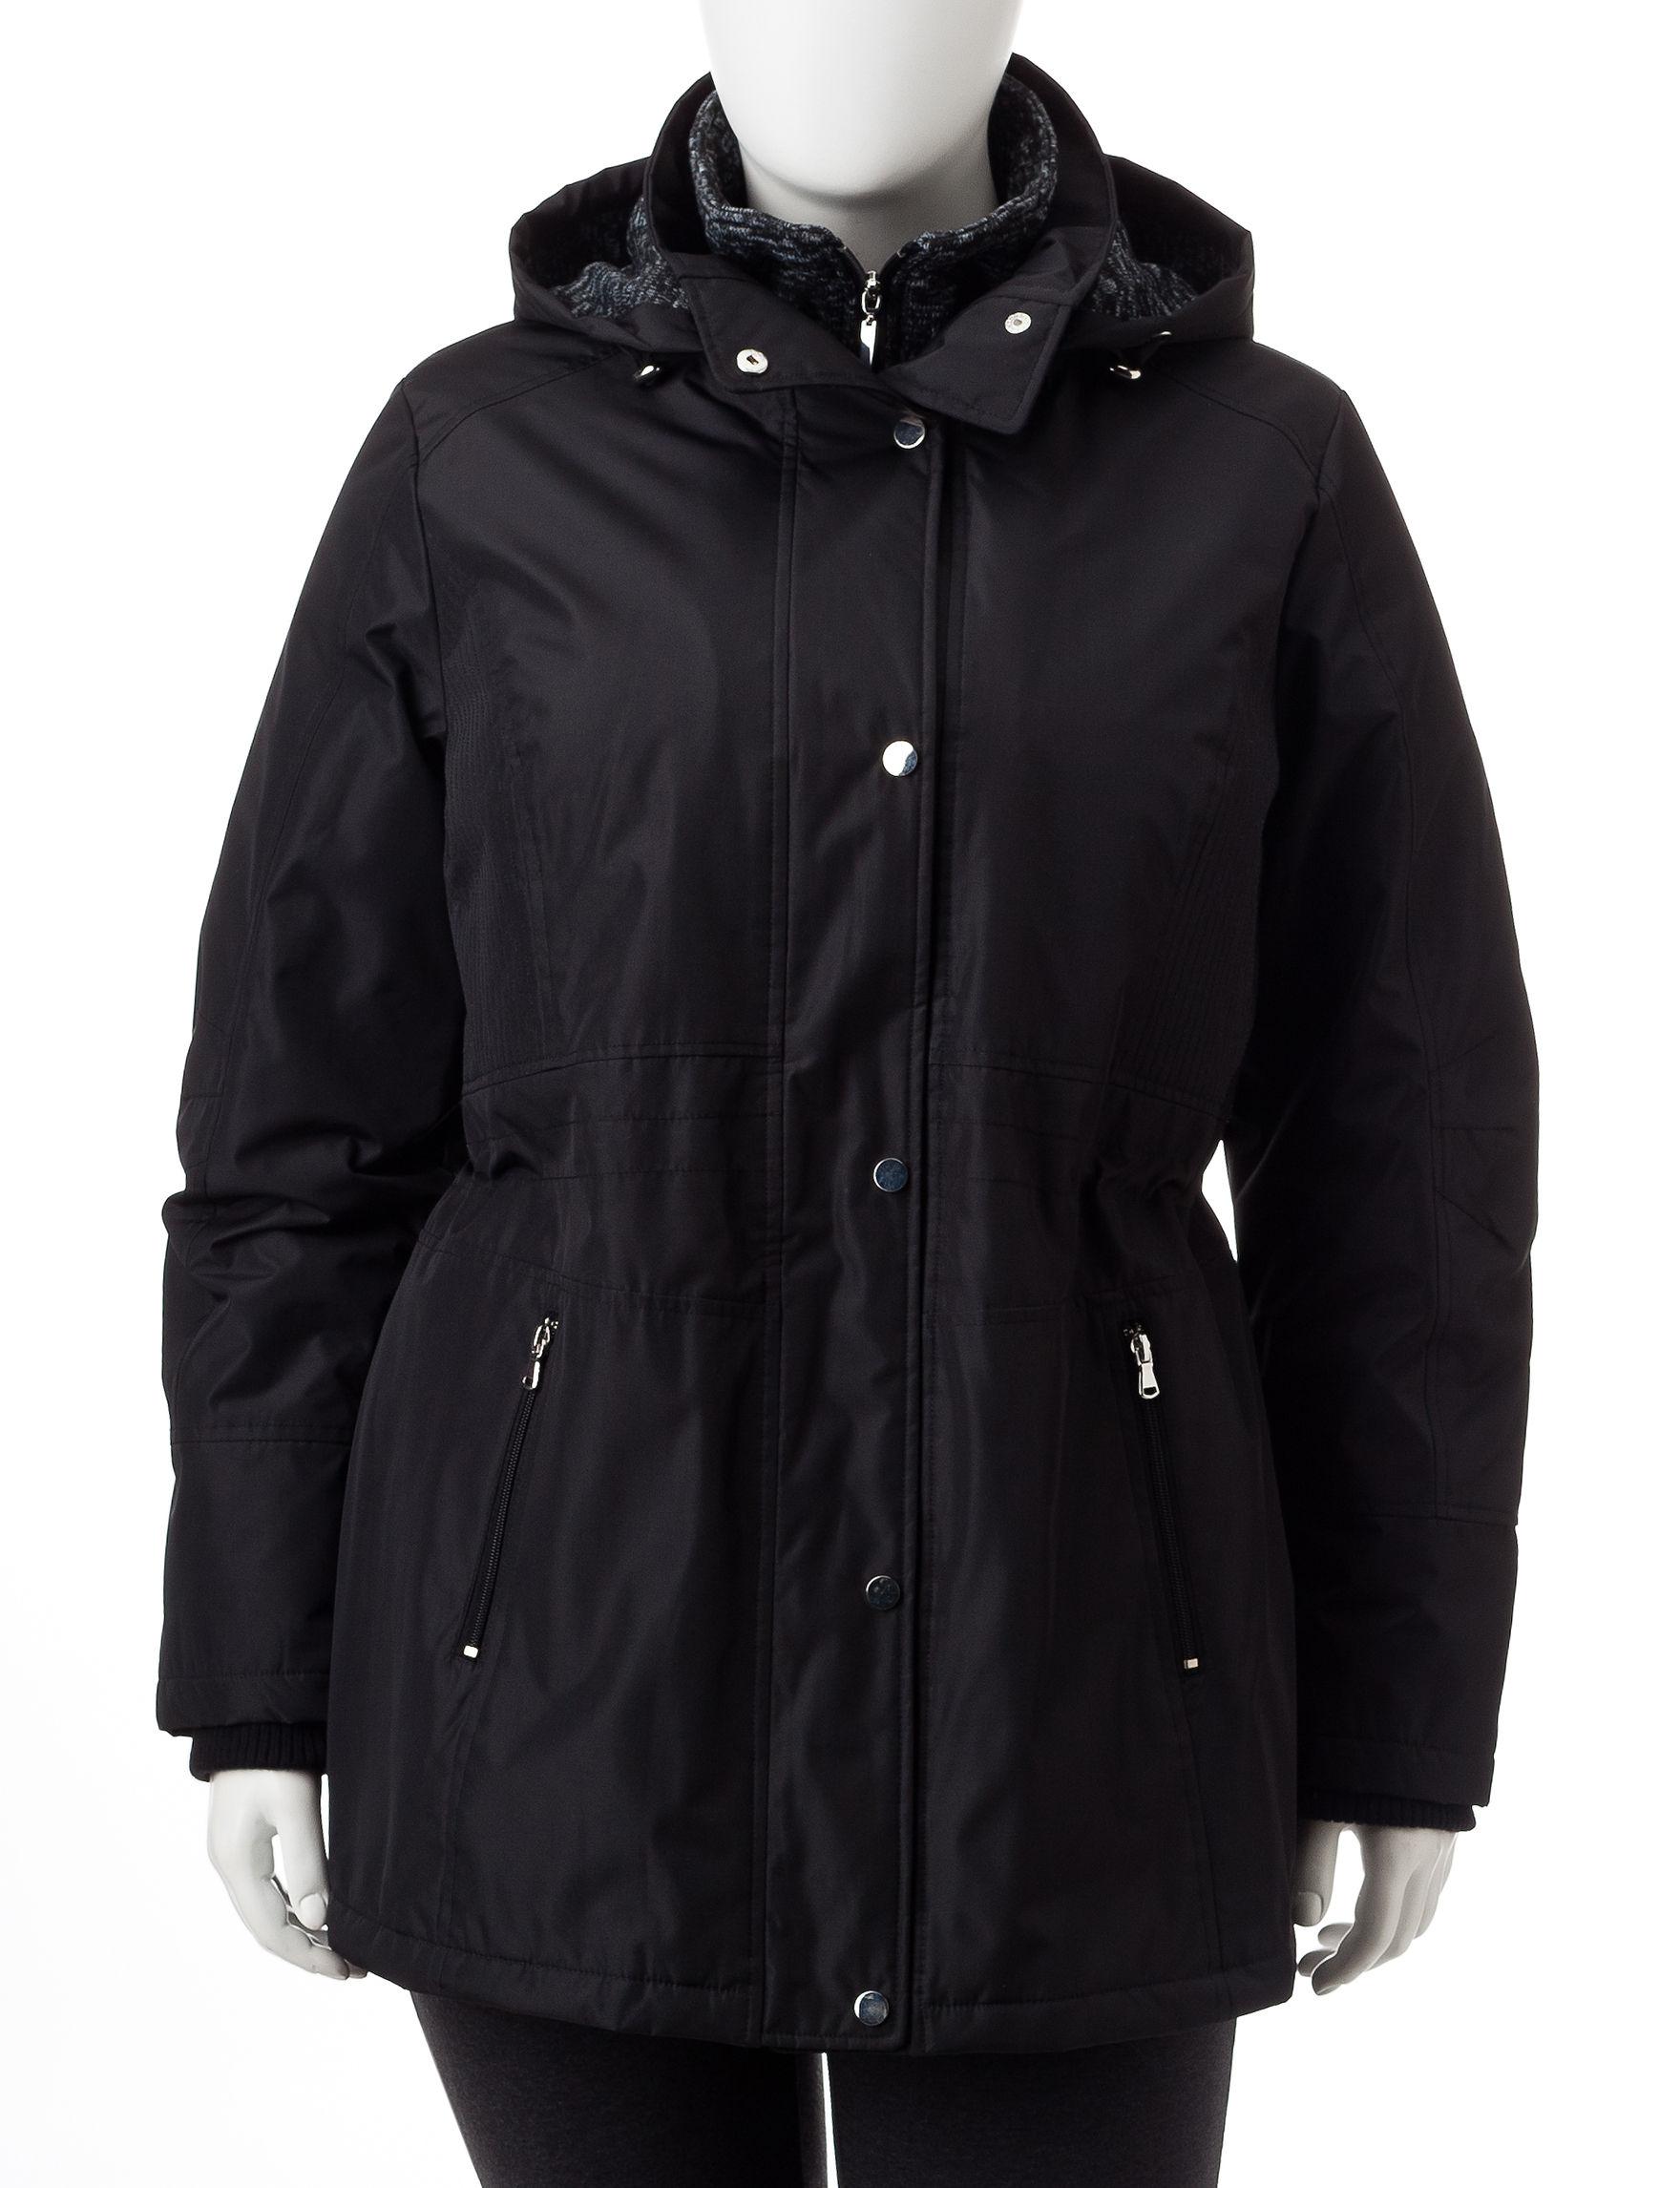 Valerie Stevens Black Rain & Snow Jackets